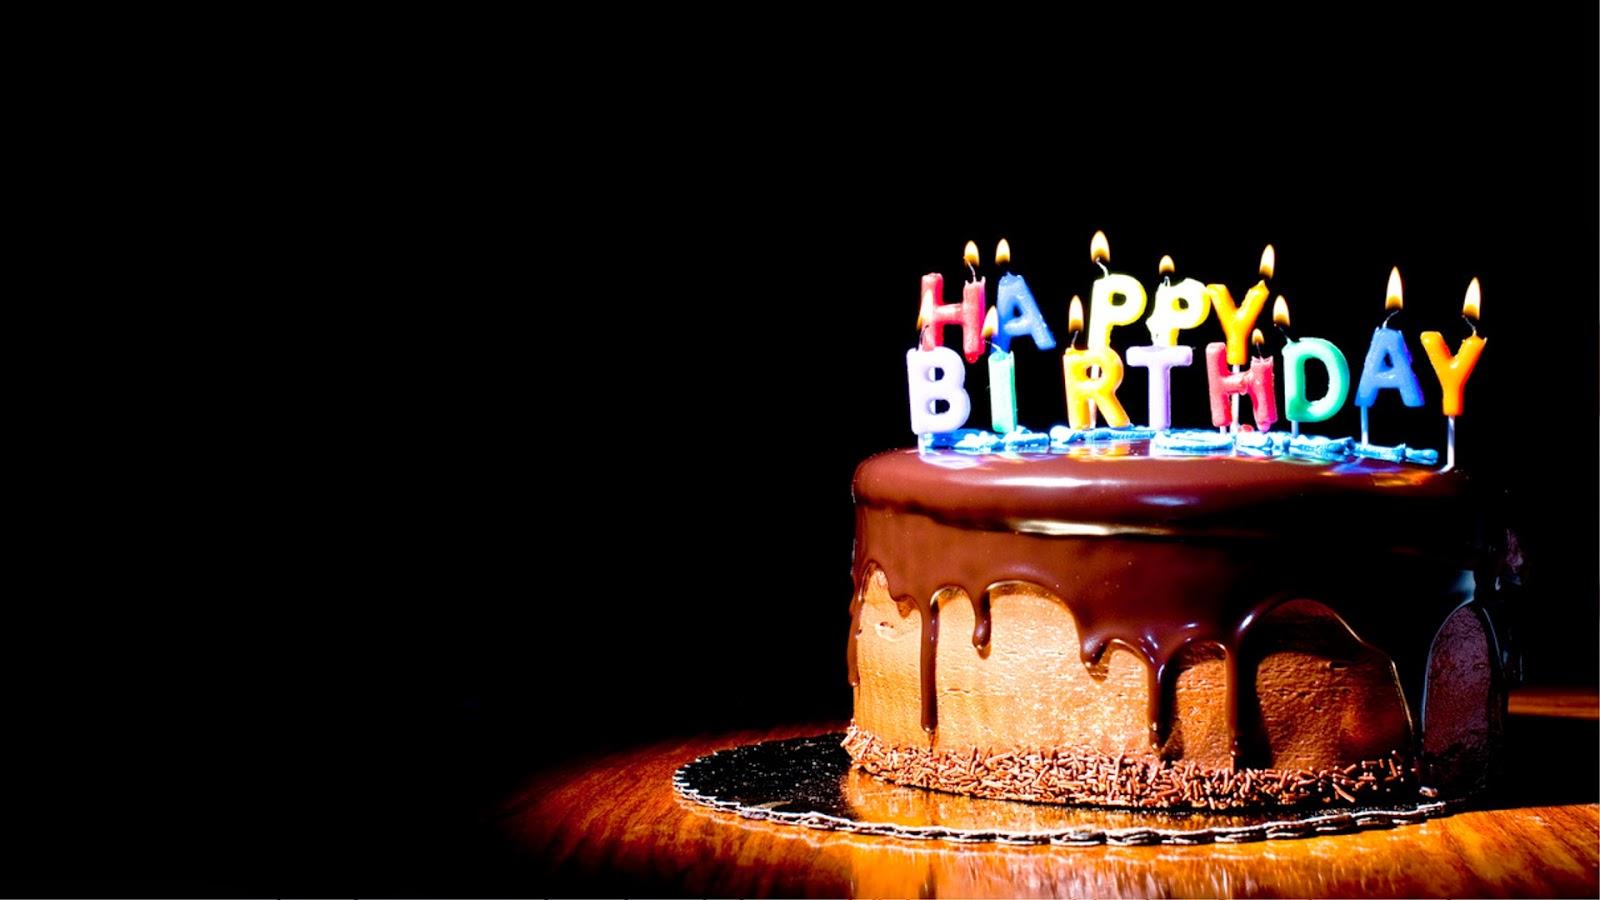 Birthdaywish Photos Latast Photo Hd Images Wallpaper